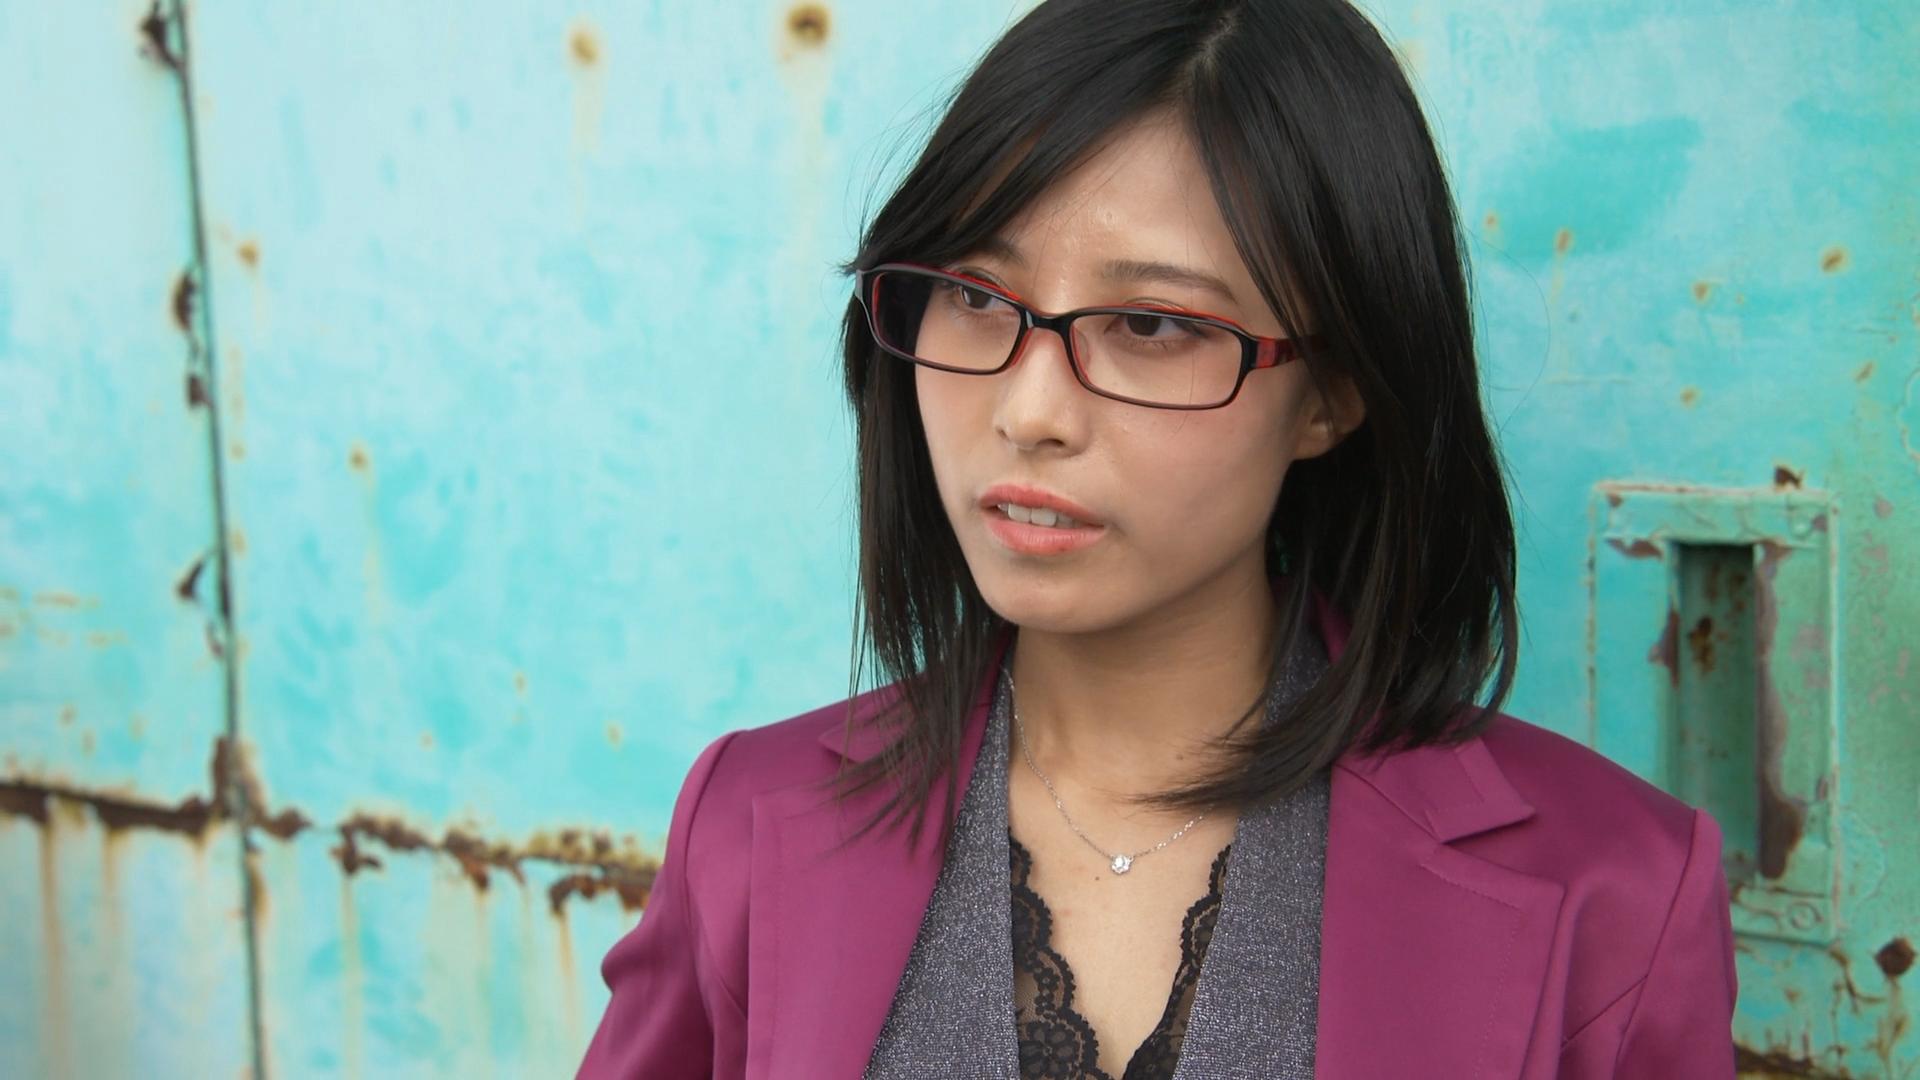 Masako Suzuka